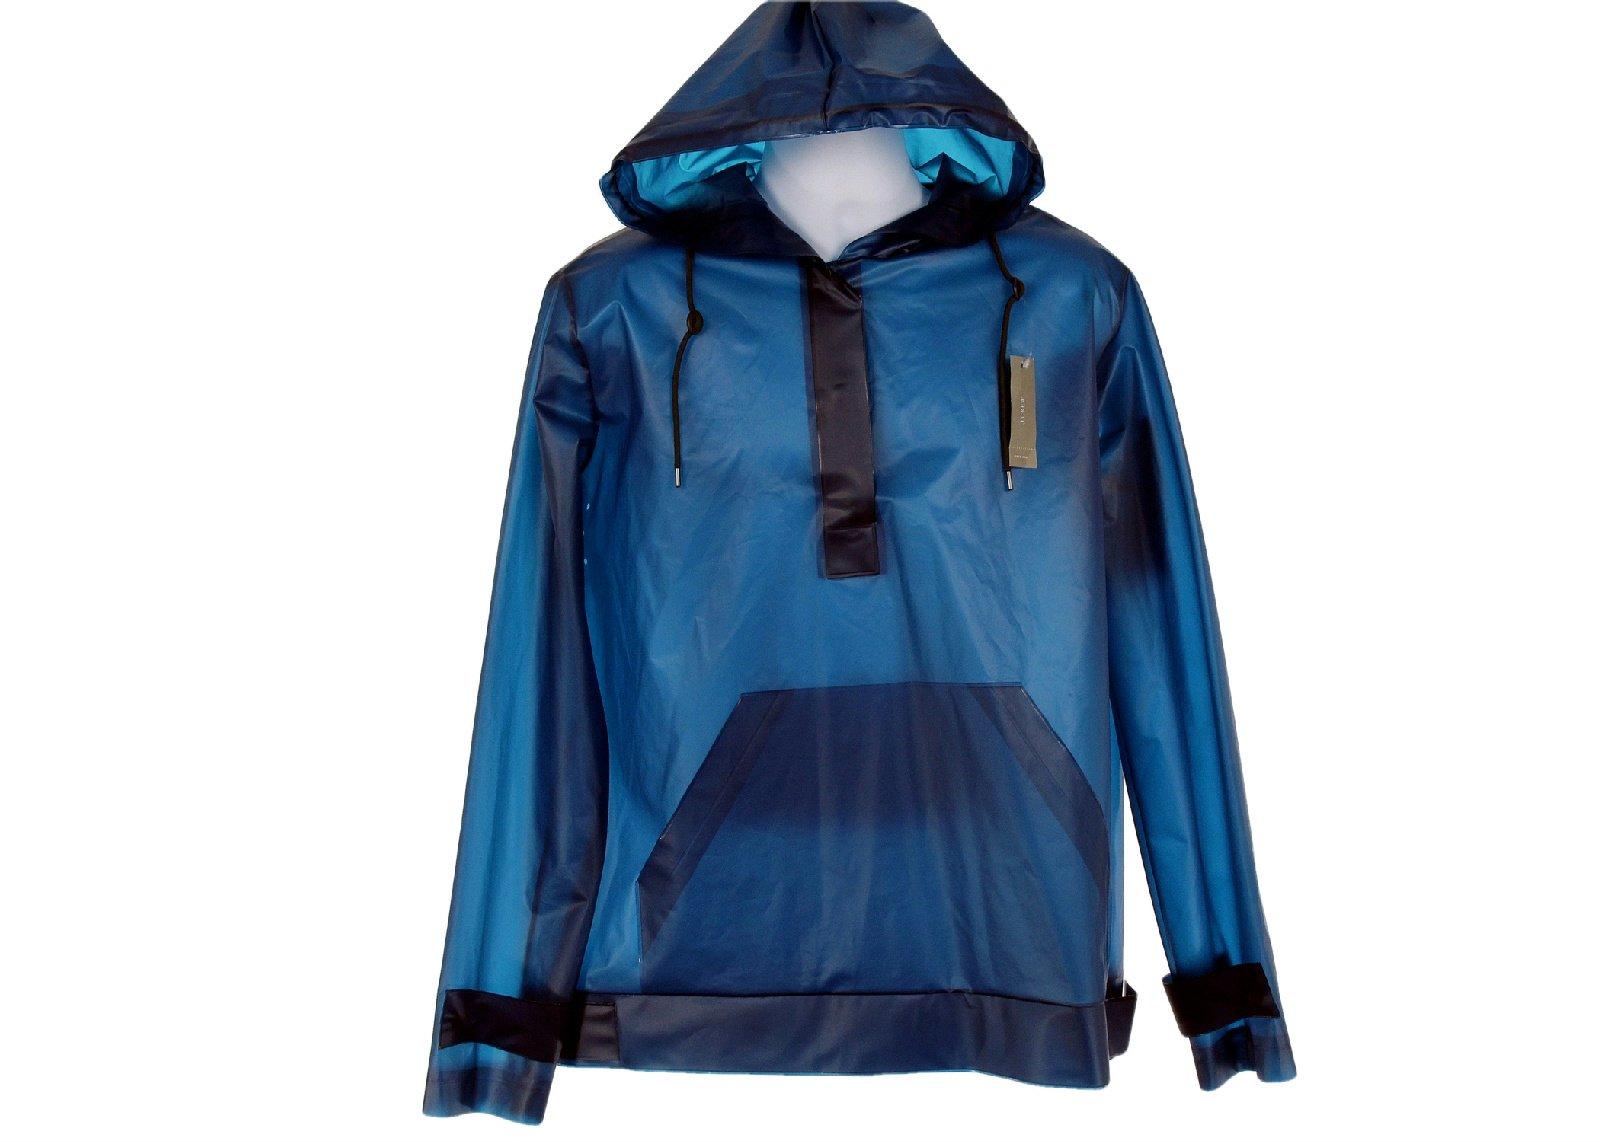 J Crew Terra New York Sporty Hoody Jacket Sz Extra Small Style C6929 New